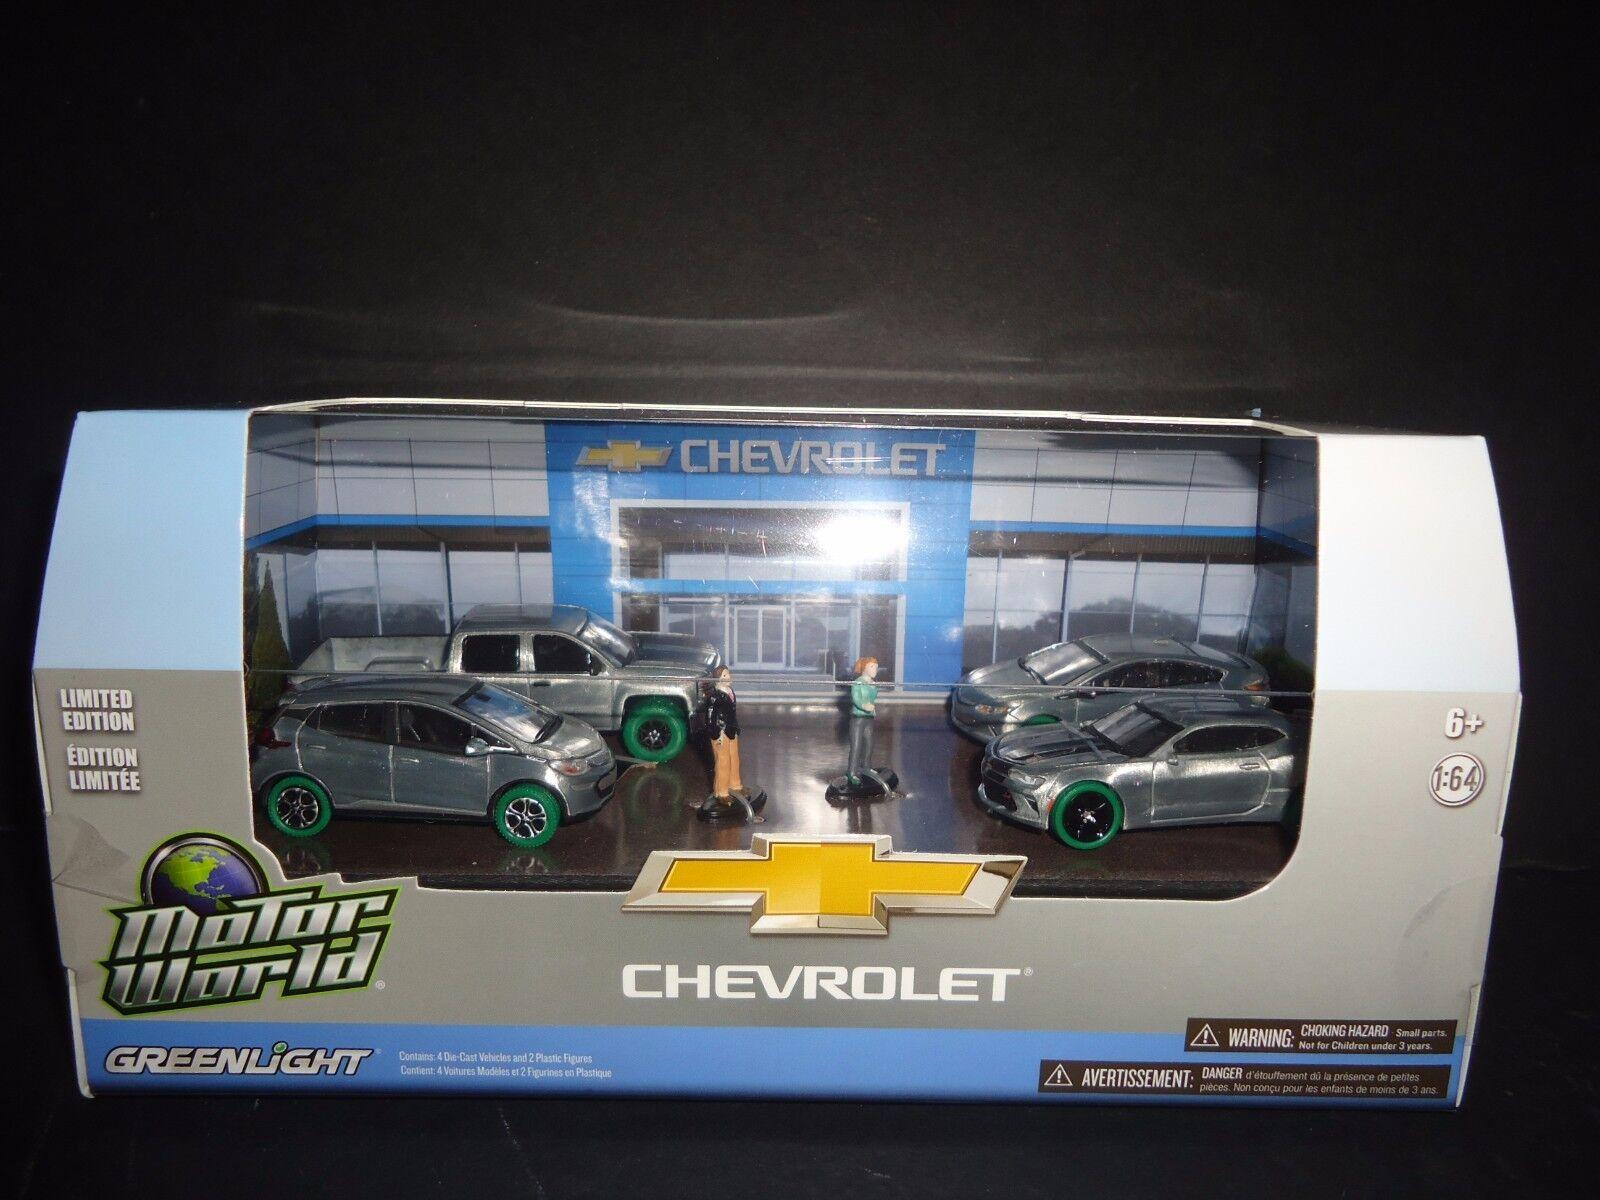 Greenlight Modern Chevrolet Dealership 6 pcs set 1 64 58034 CHASE